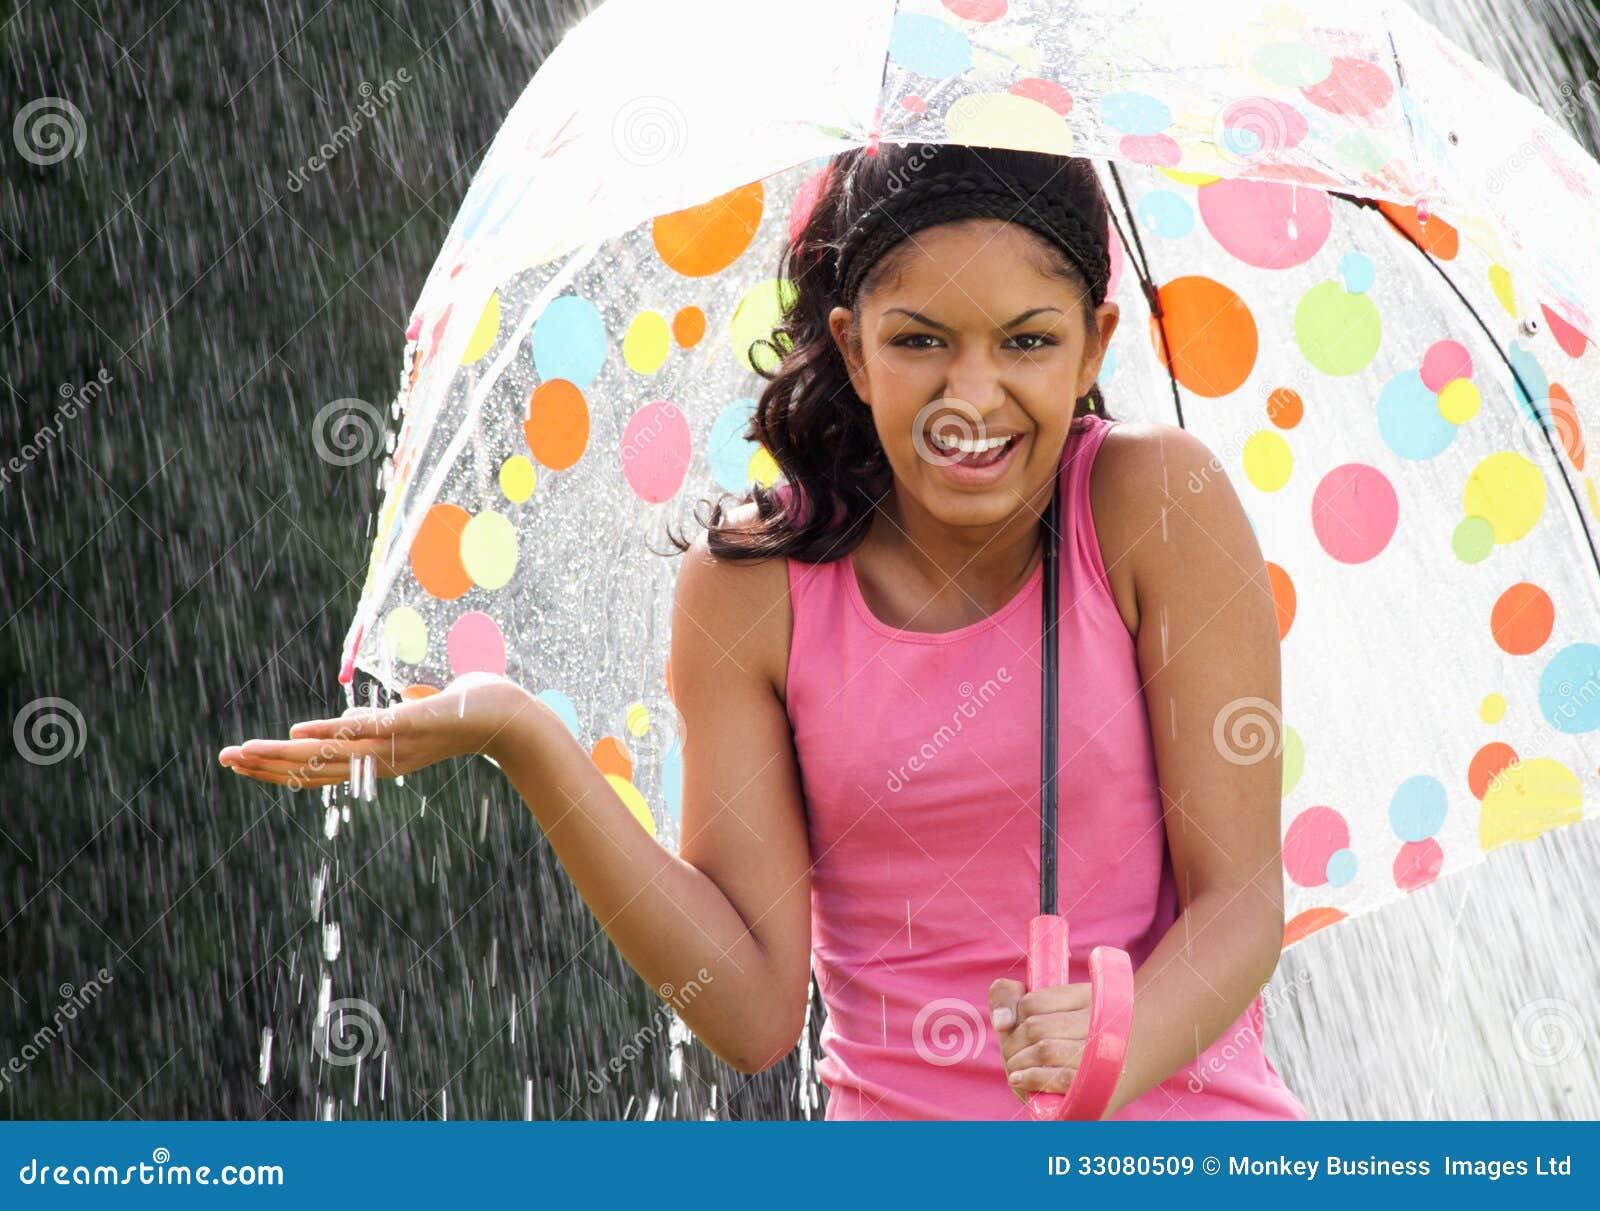 Teenage Girl Sheltering From Rain Beneath Umbrella Royalty